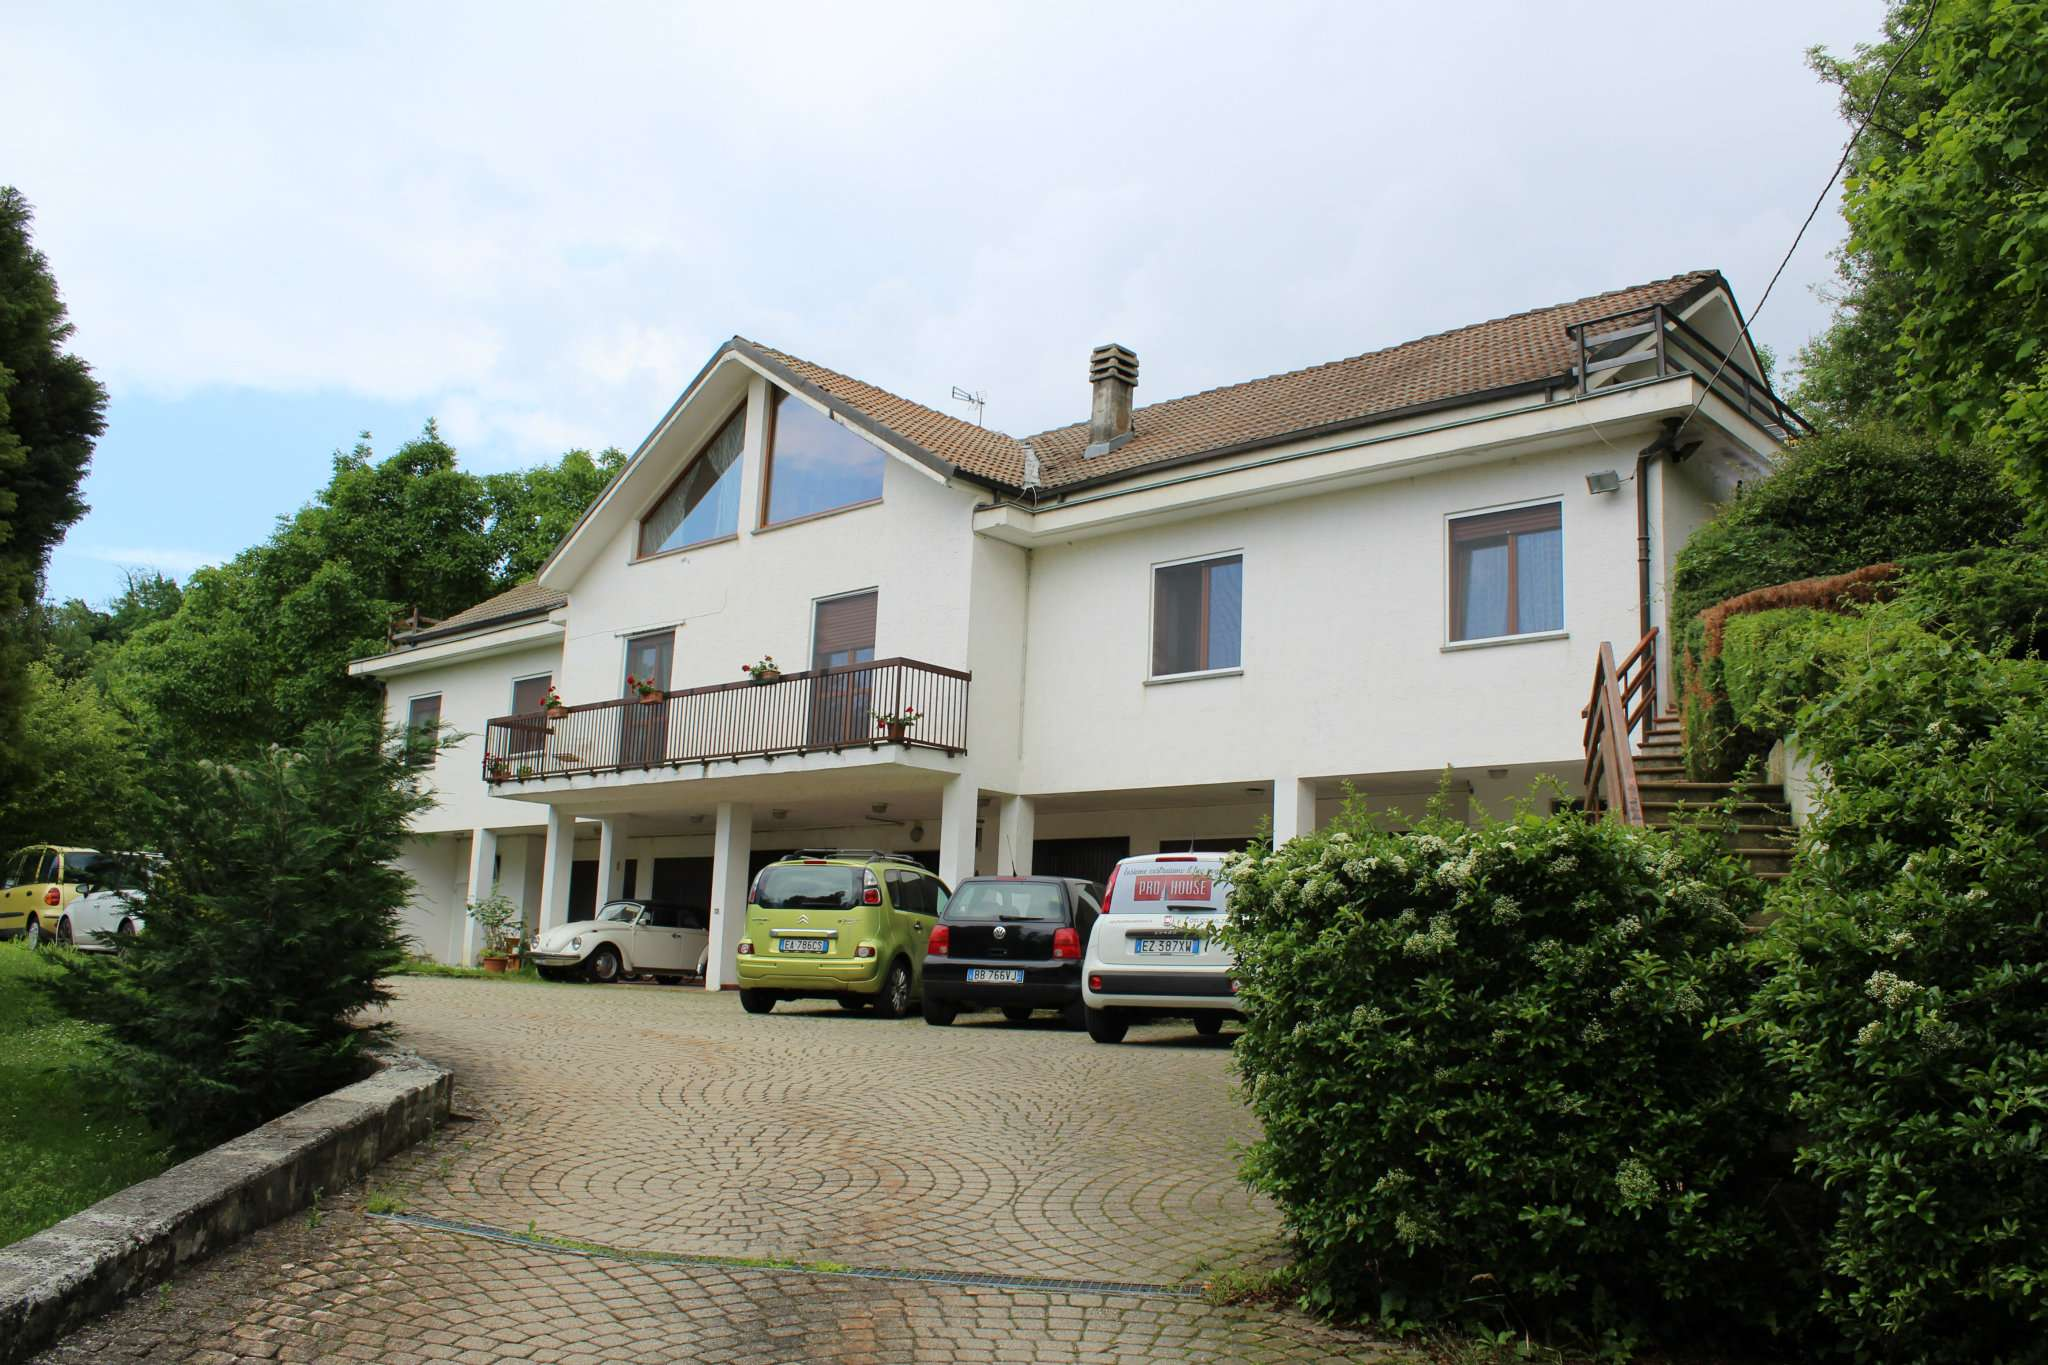 Foto 1 di Villa Quadrifamiliare via Pragelato 17, frazione Piana San Raffaele, San Raffaele Cimena